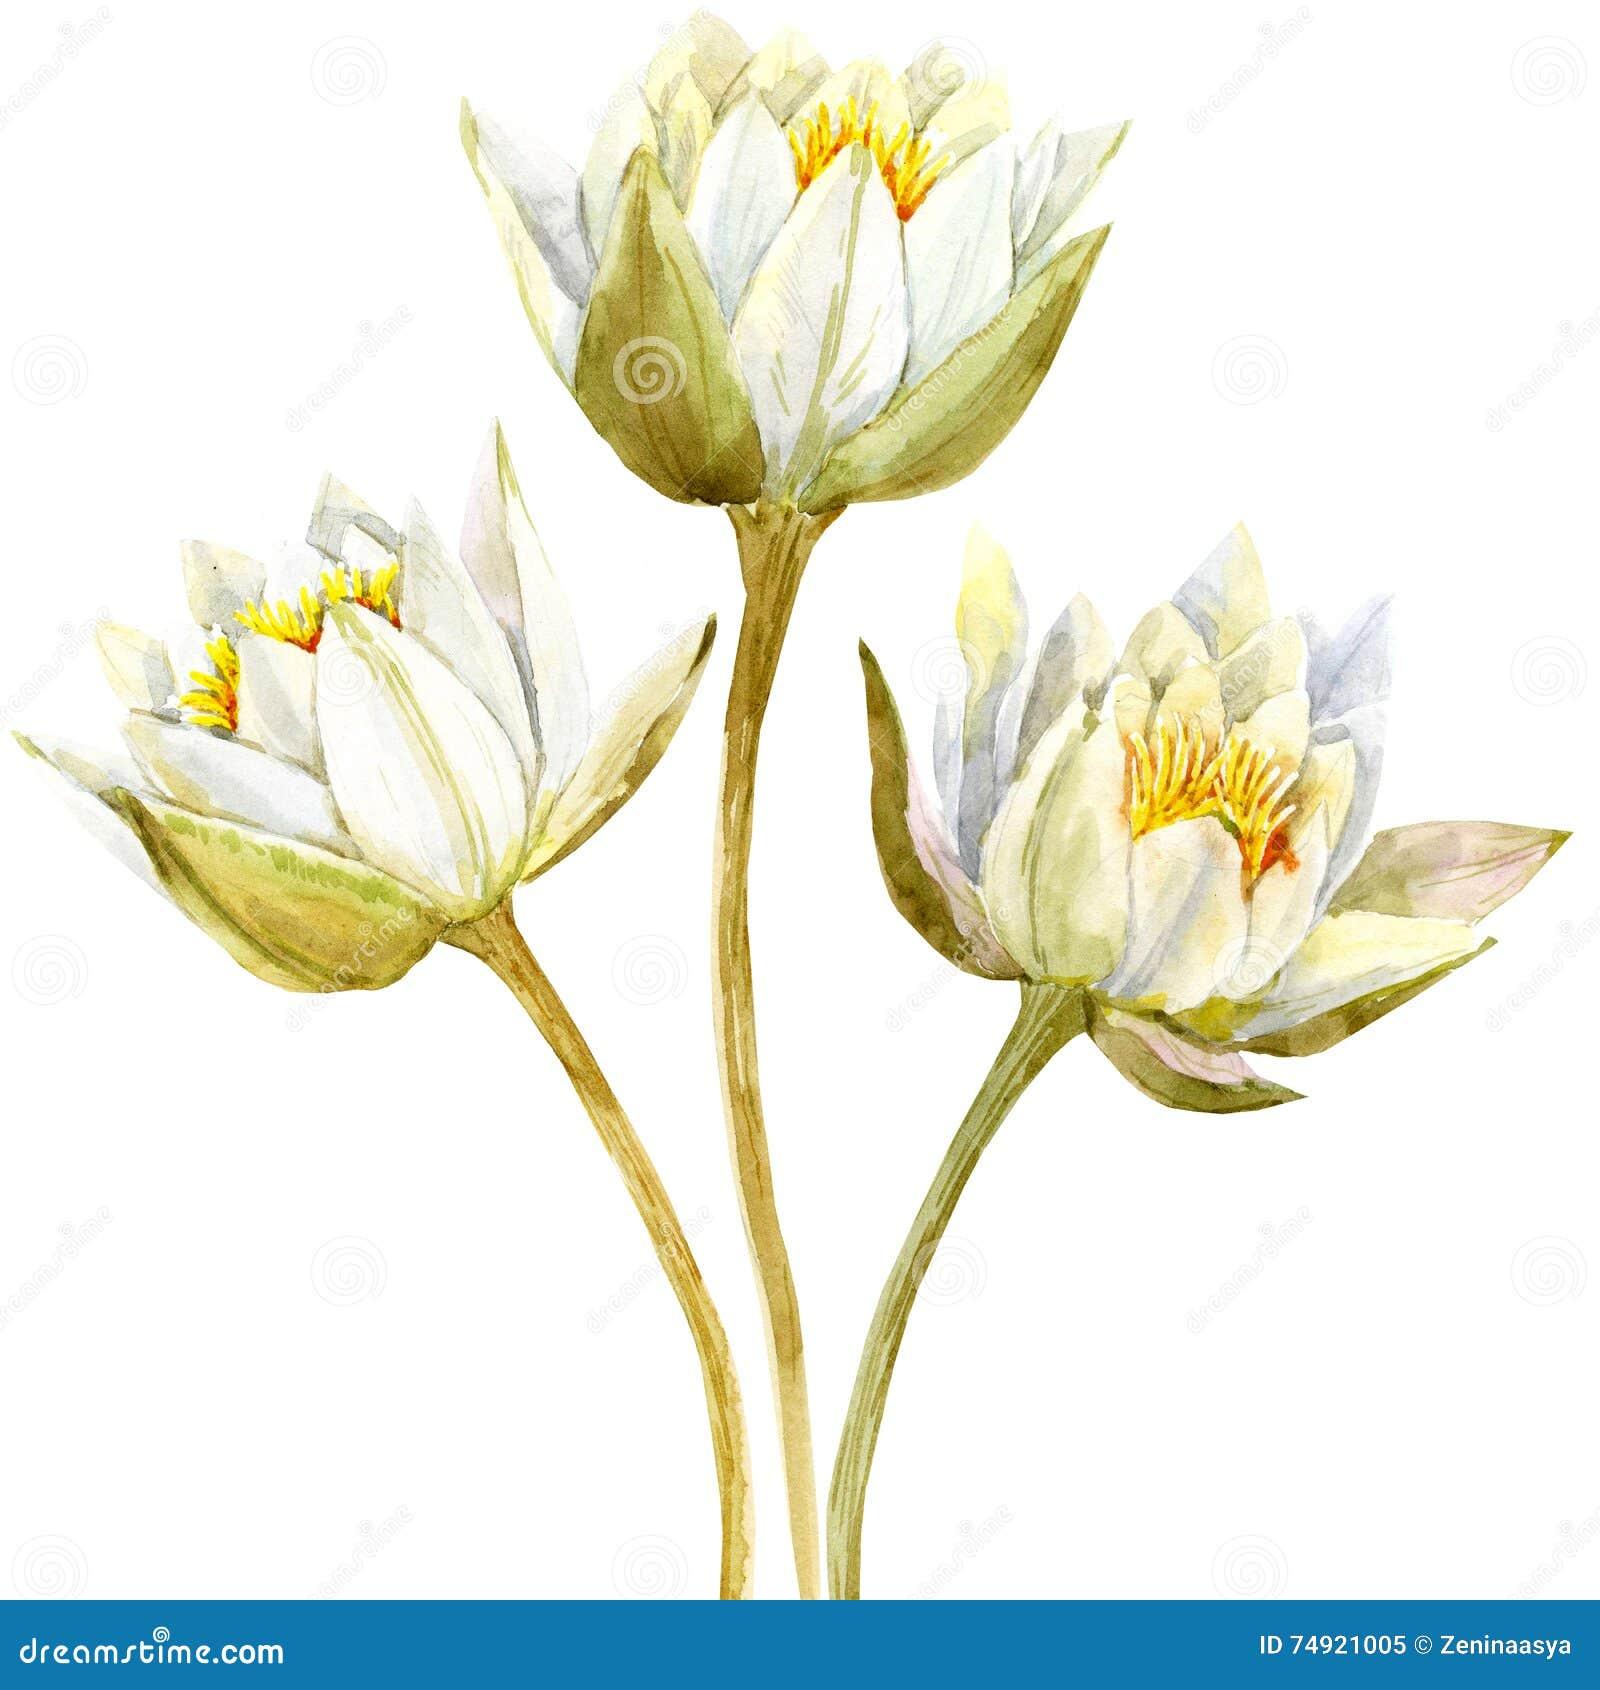 Lotus Flower Means Gallery Flower Wallpaper Hd